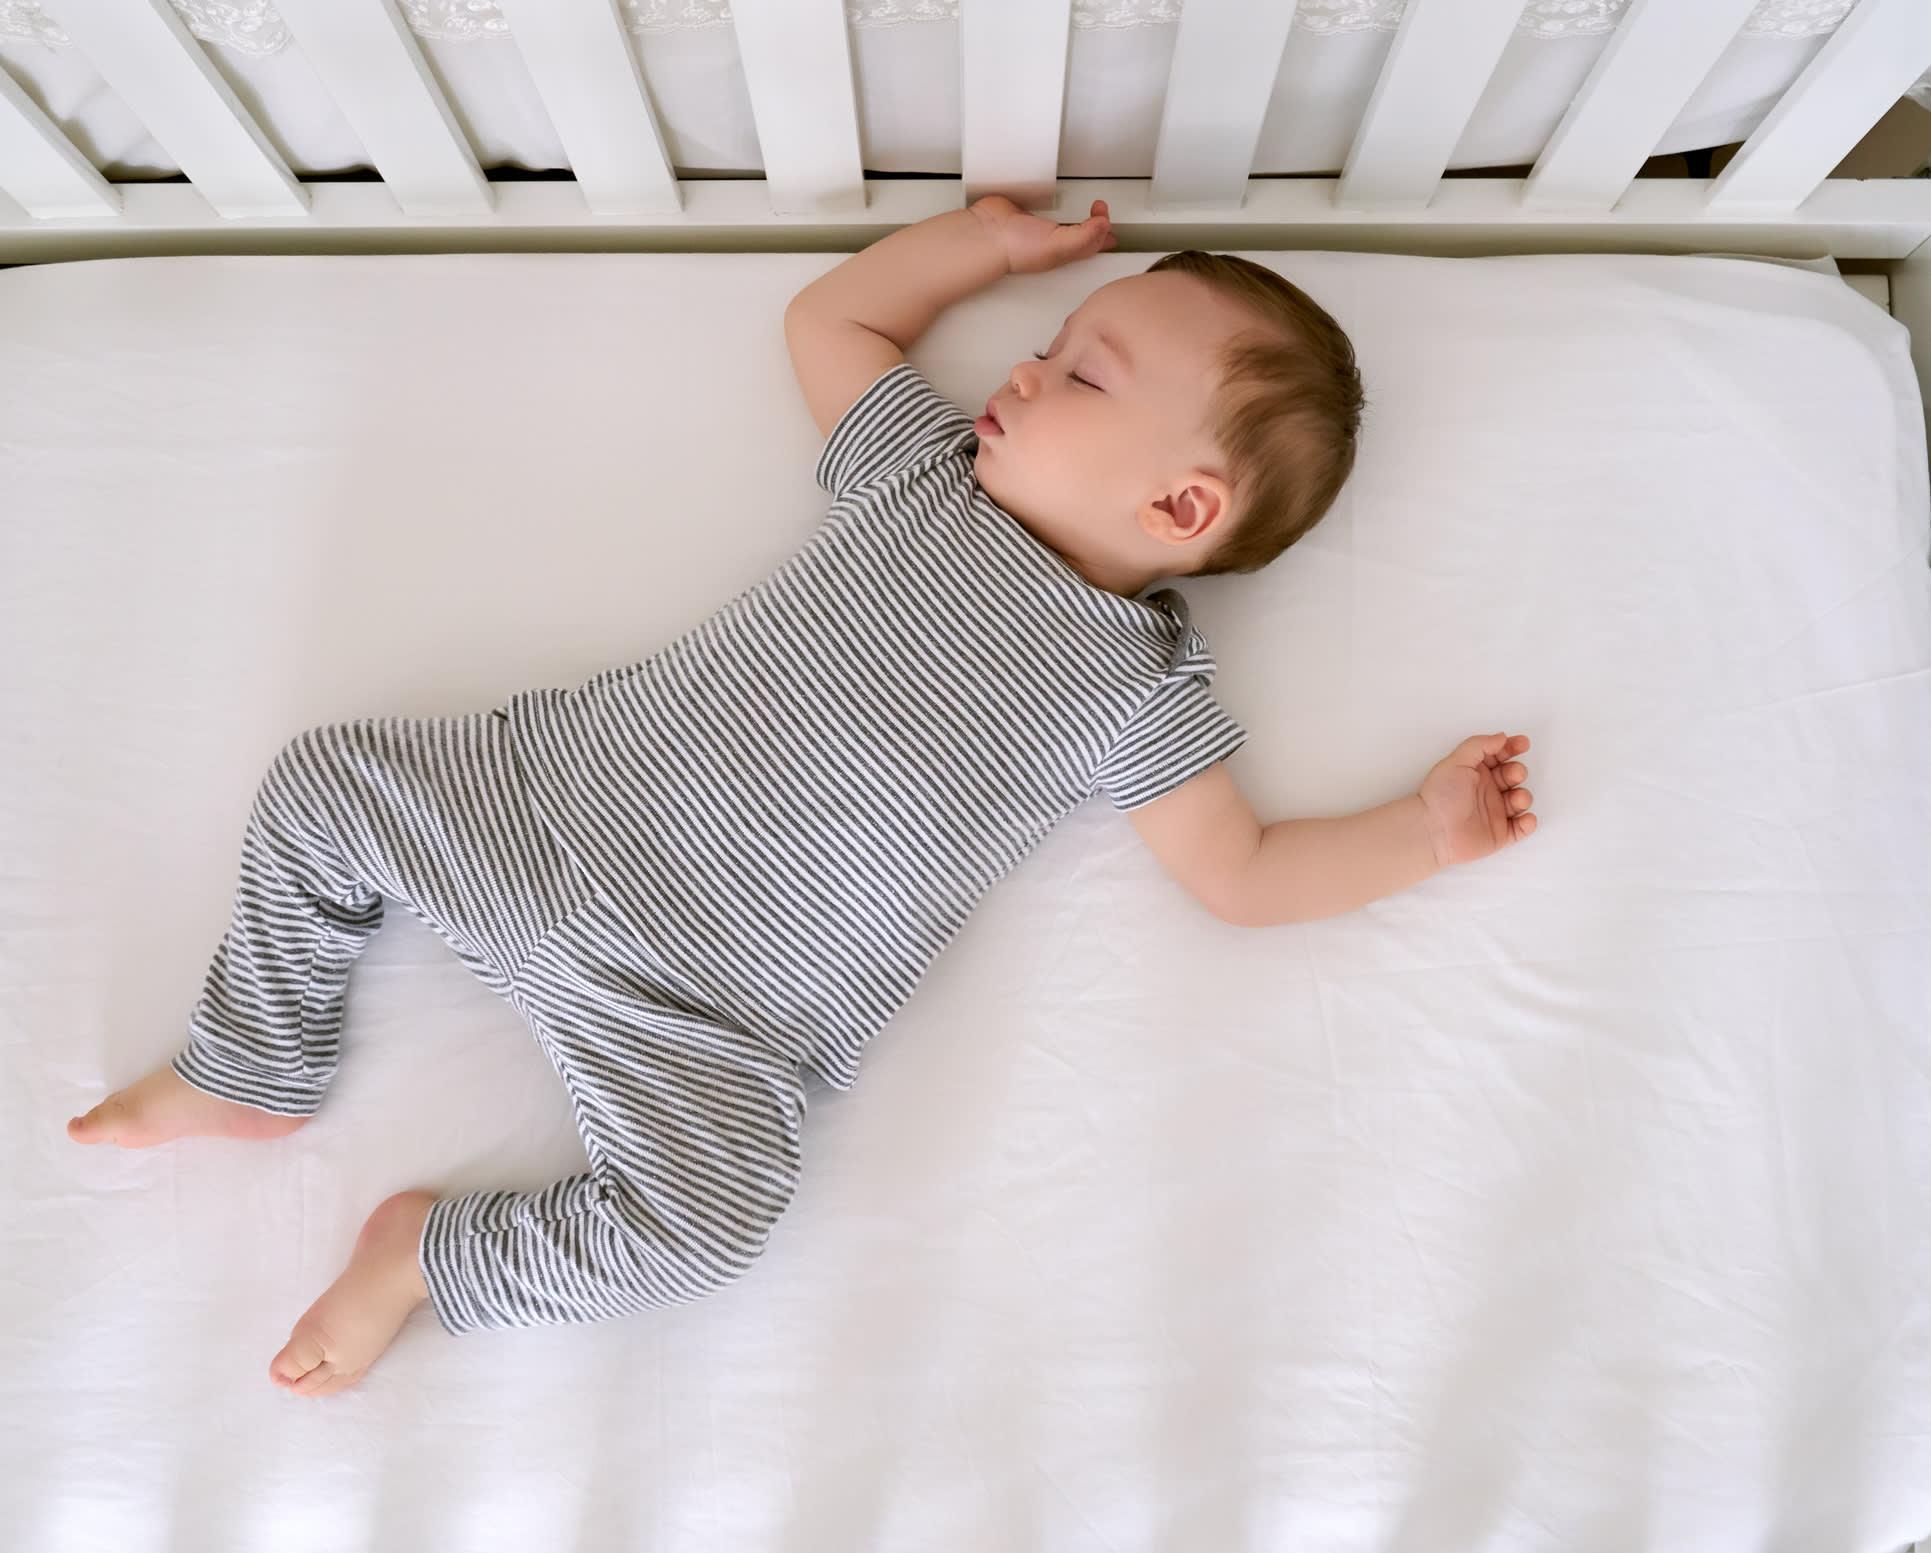 baby sleeps on mattress